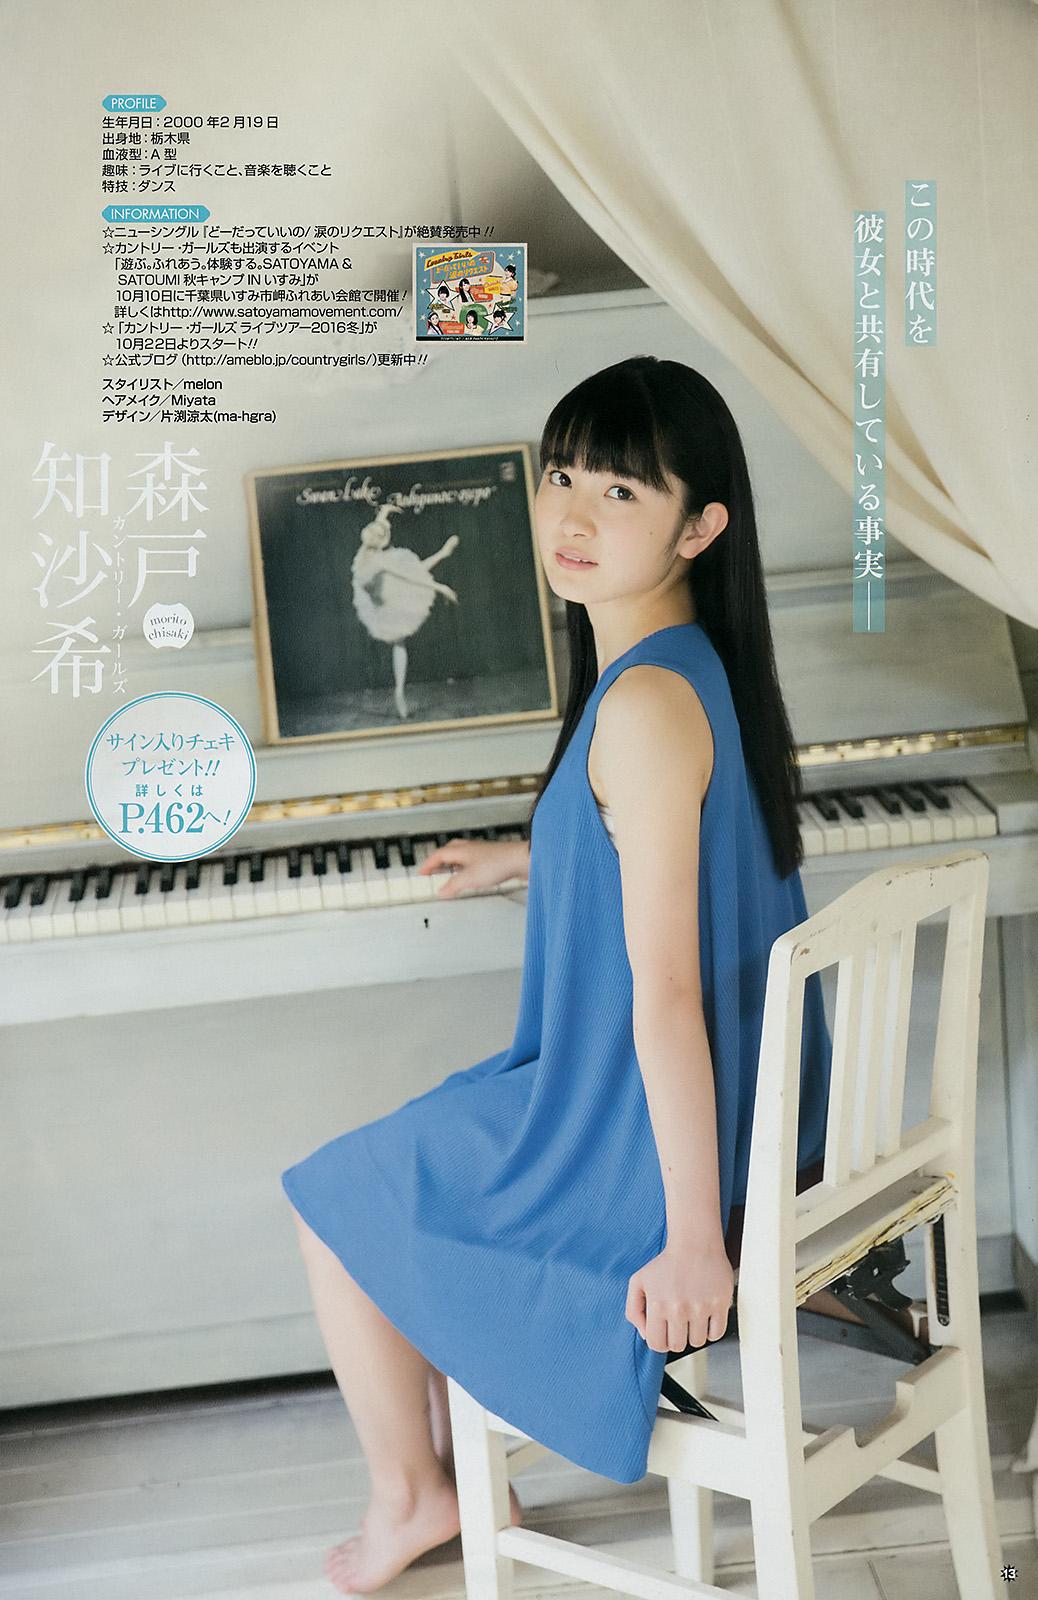 Morito Chisaki 森戸知沙希 Country Girls, Young Gangan 2016.10.21 No.20